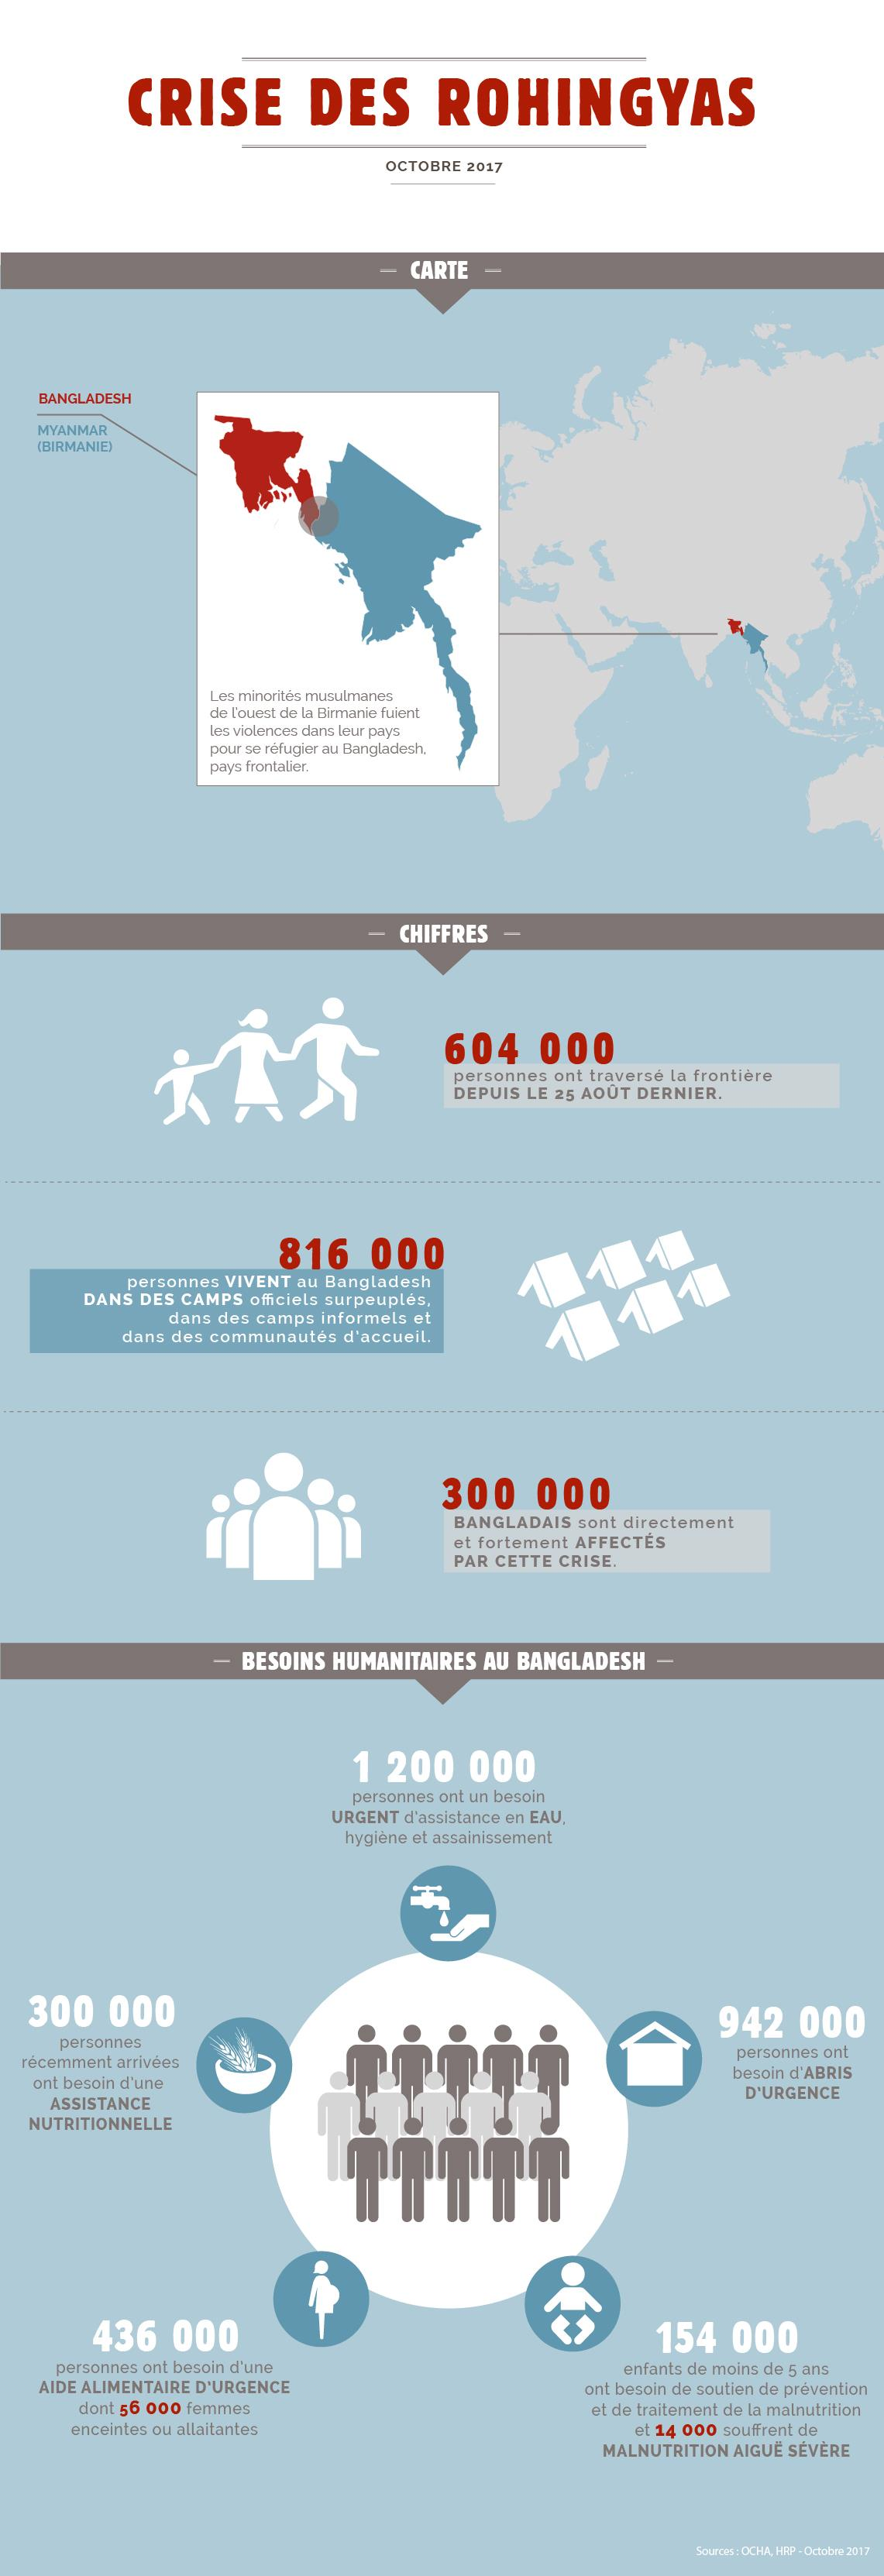 rohingyas infographie